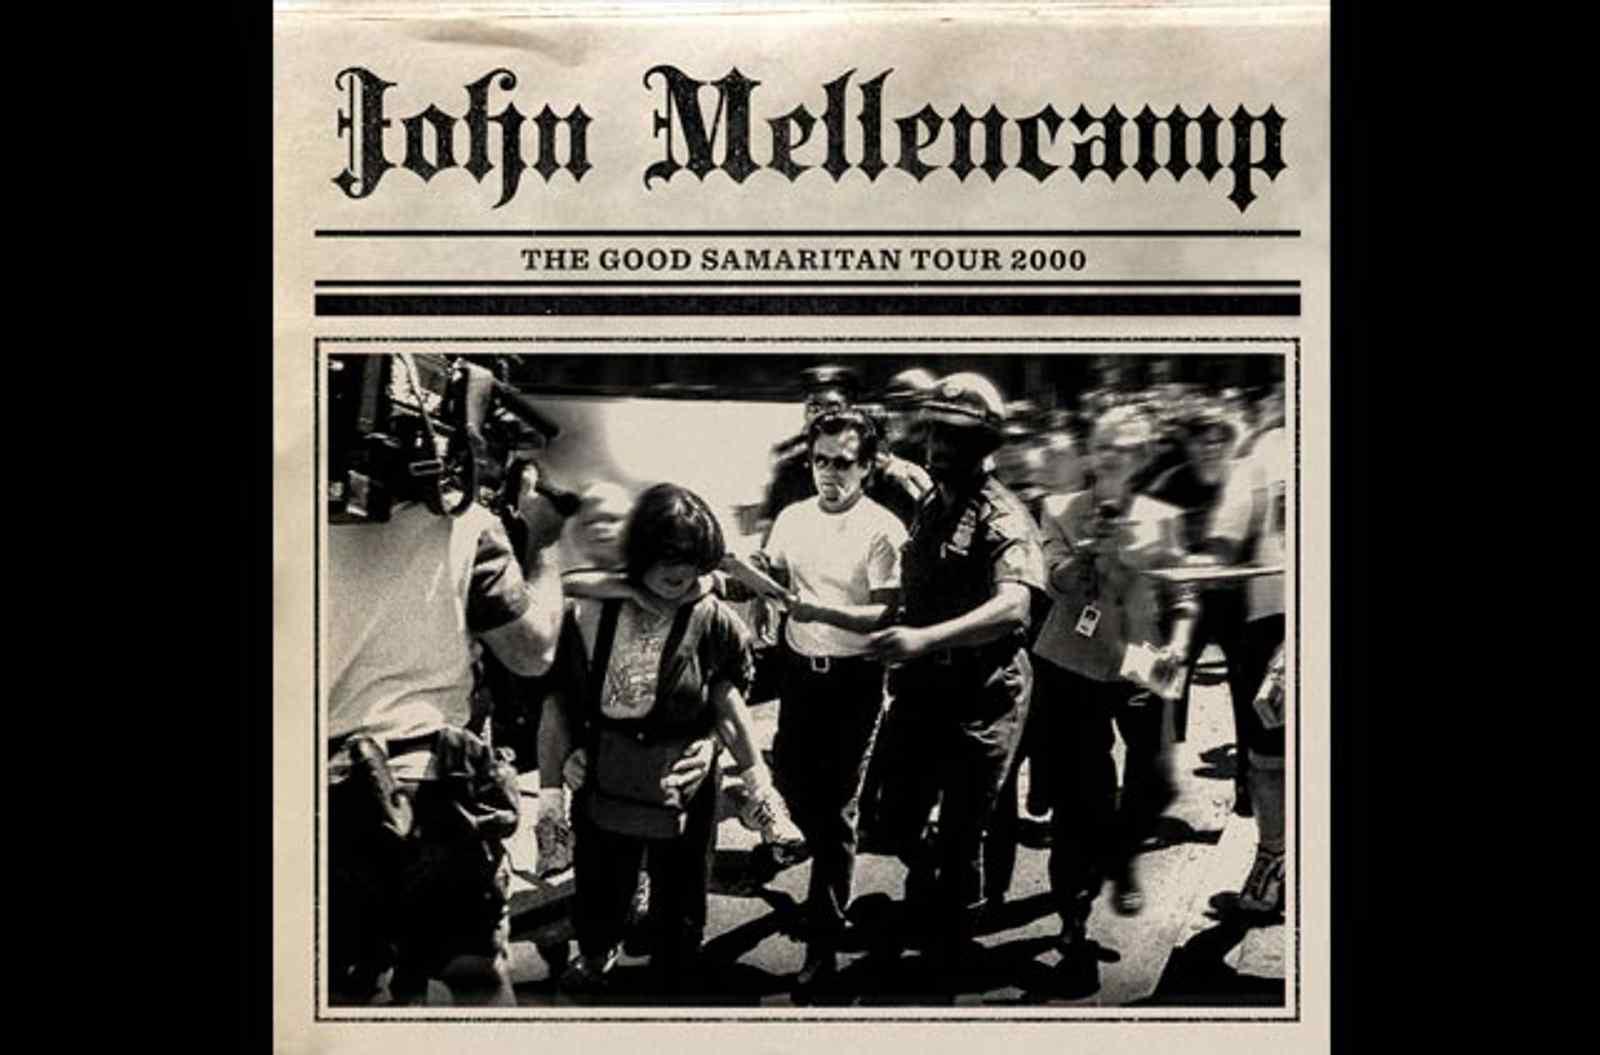 Republic Records & John Mellencamp Announce Pre-Order of The Good Samaritan Tour Live Album